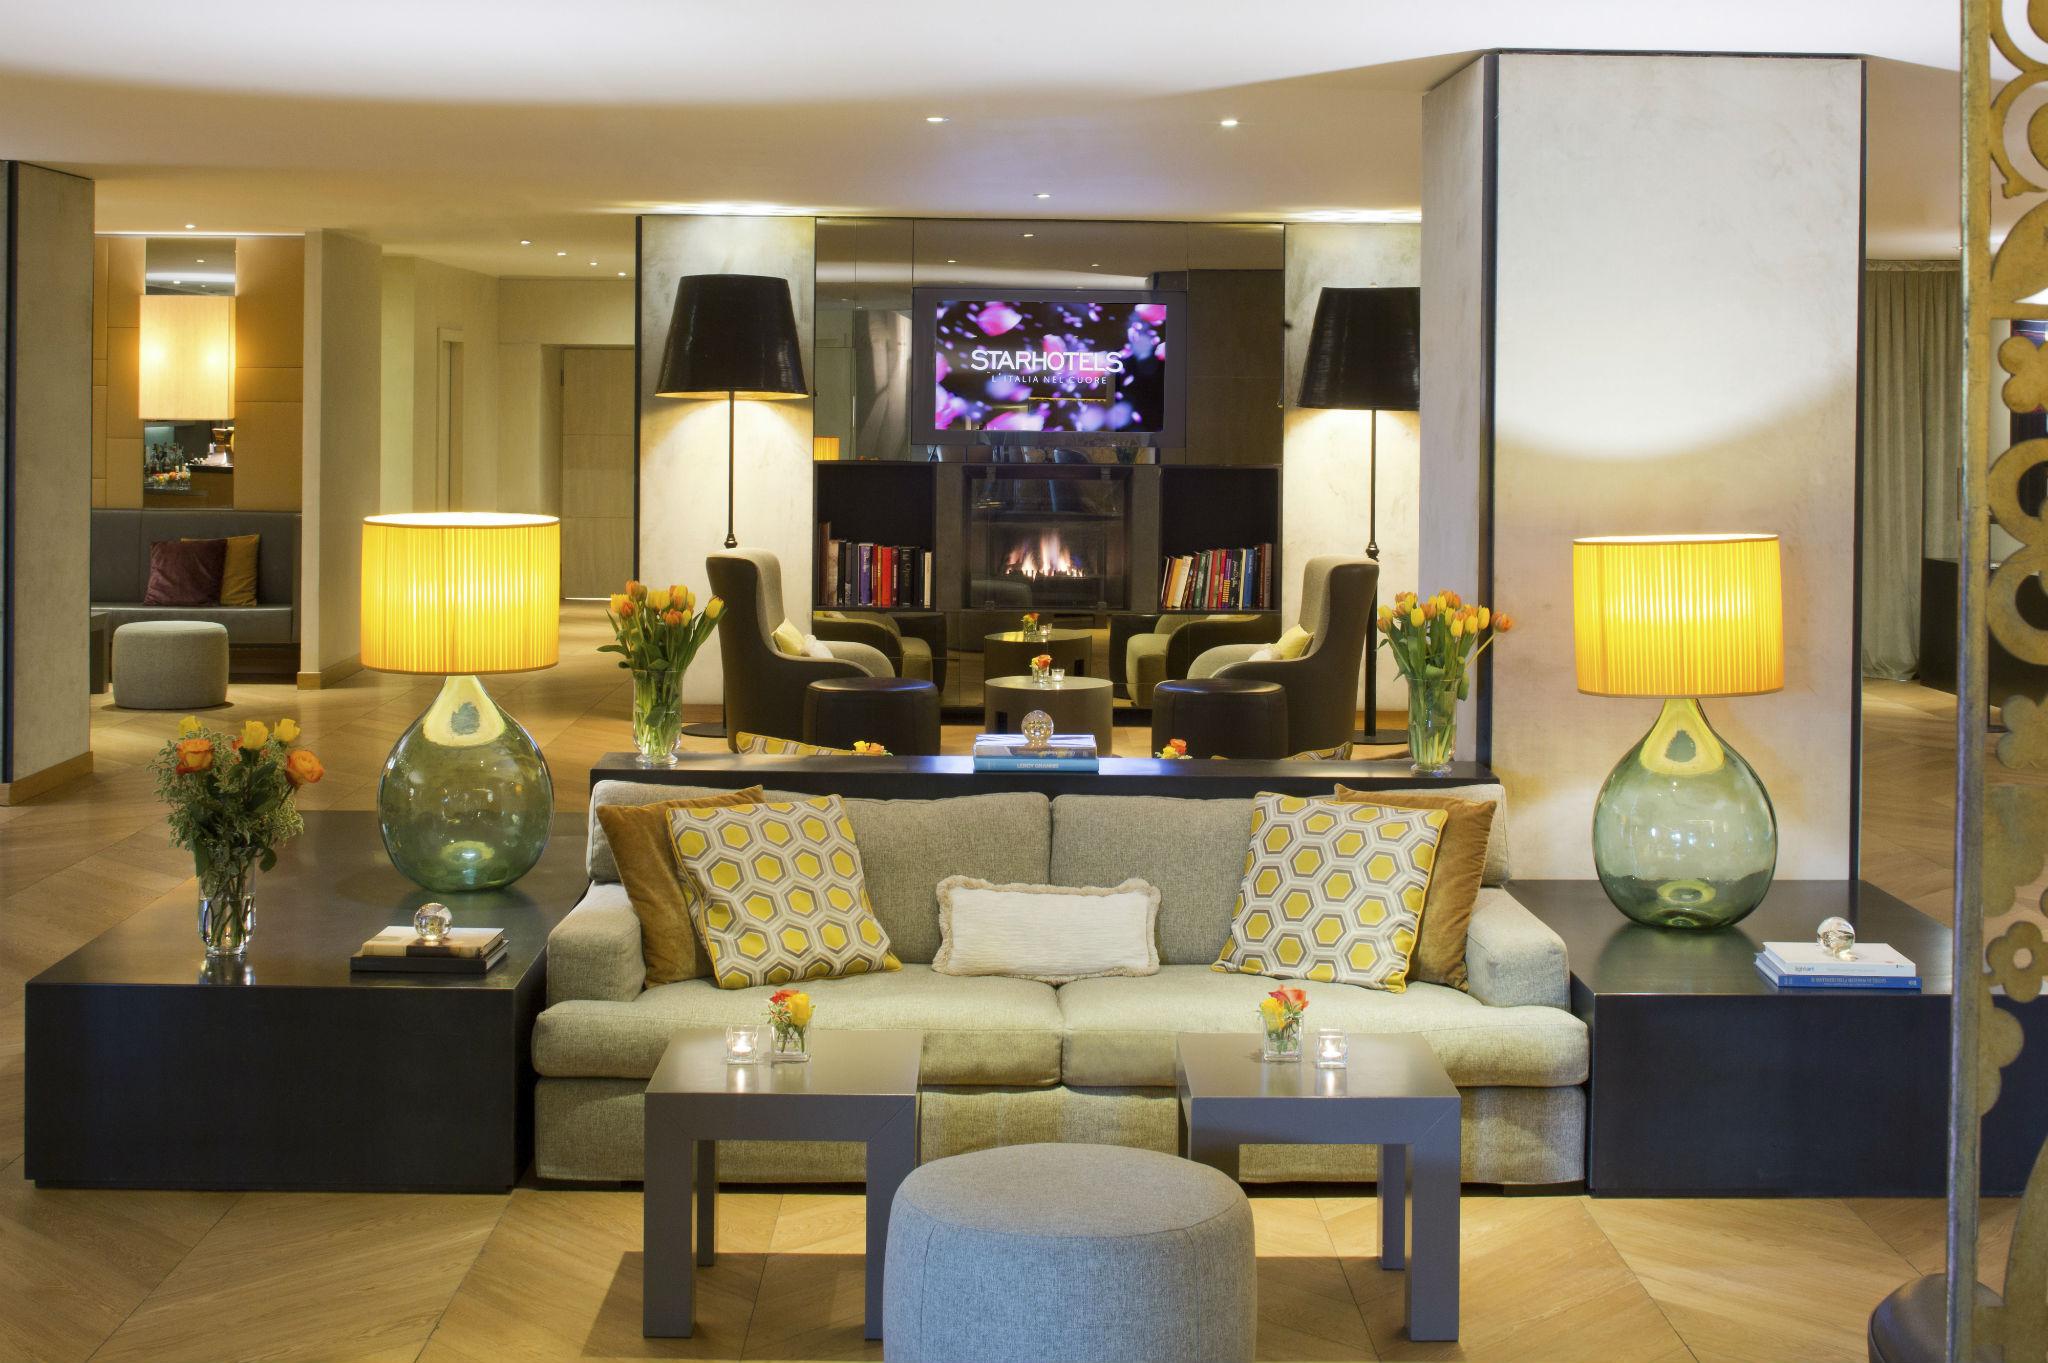 Starhotels Michelangelo, 4 star hotel in Florence Italy near ...